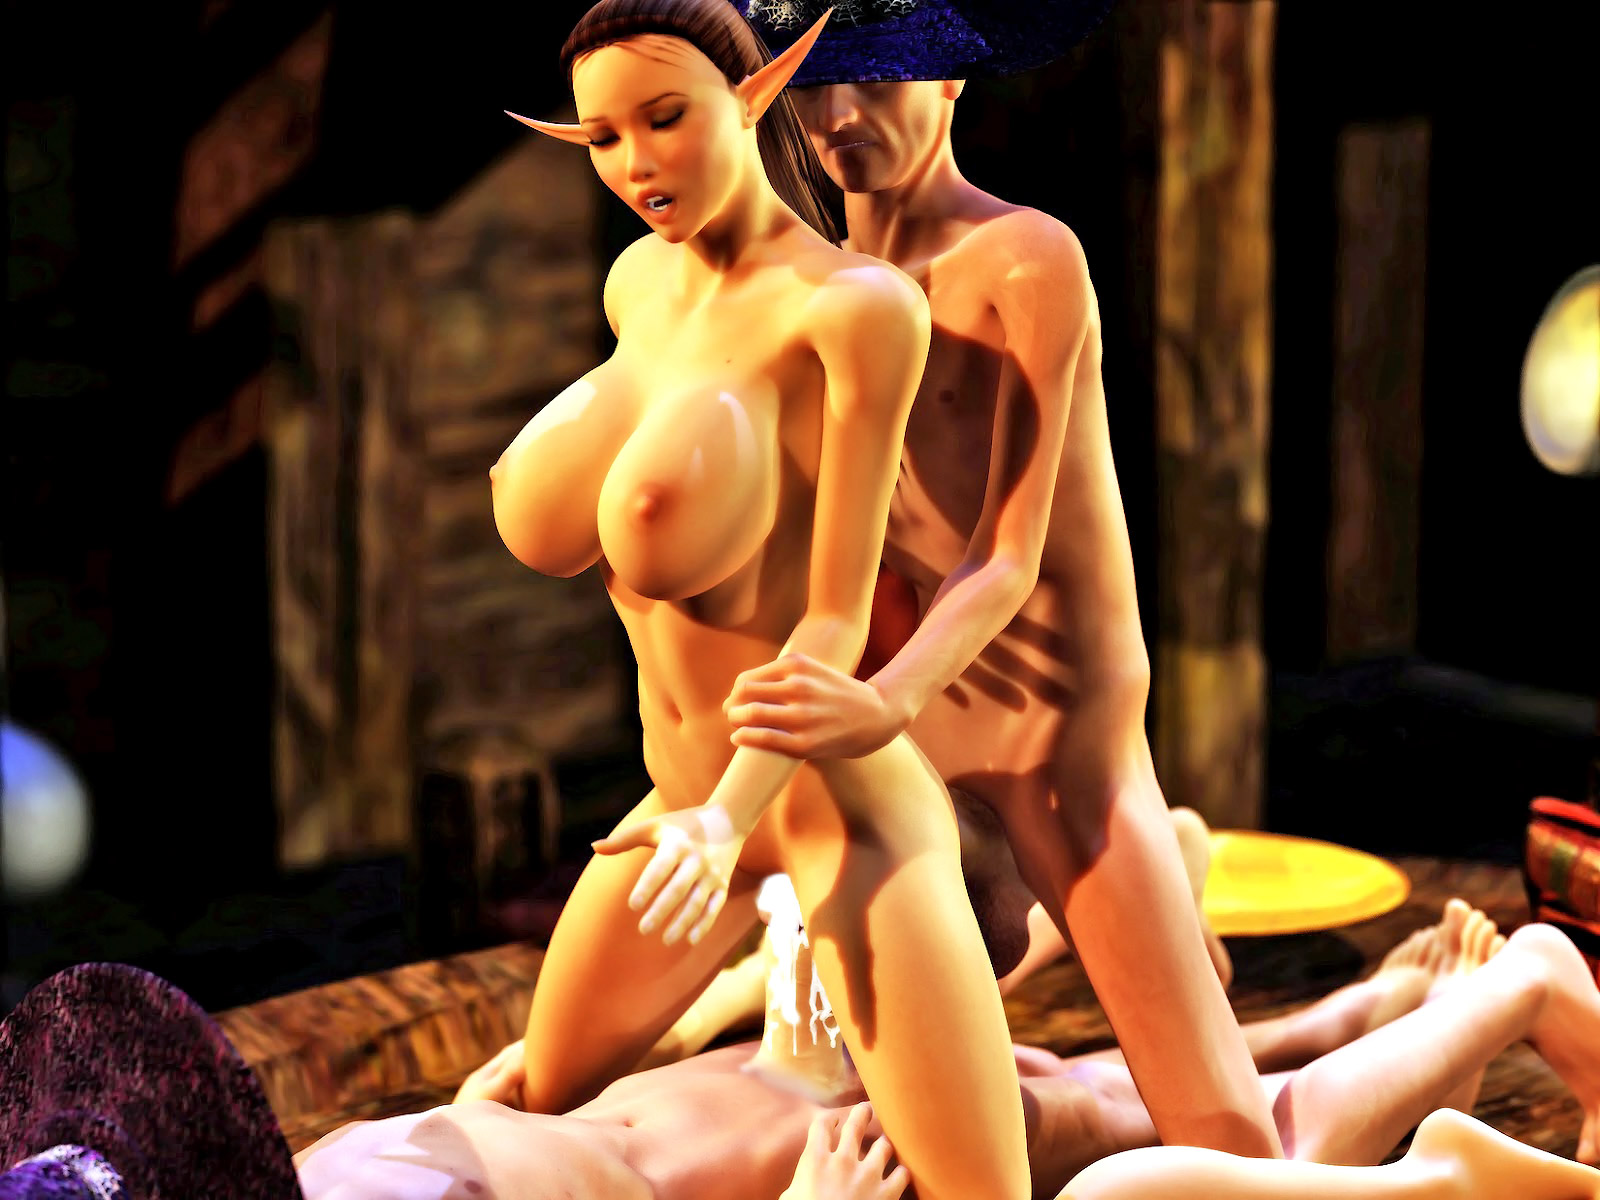 Erotic elf fiction porncraft clips